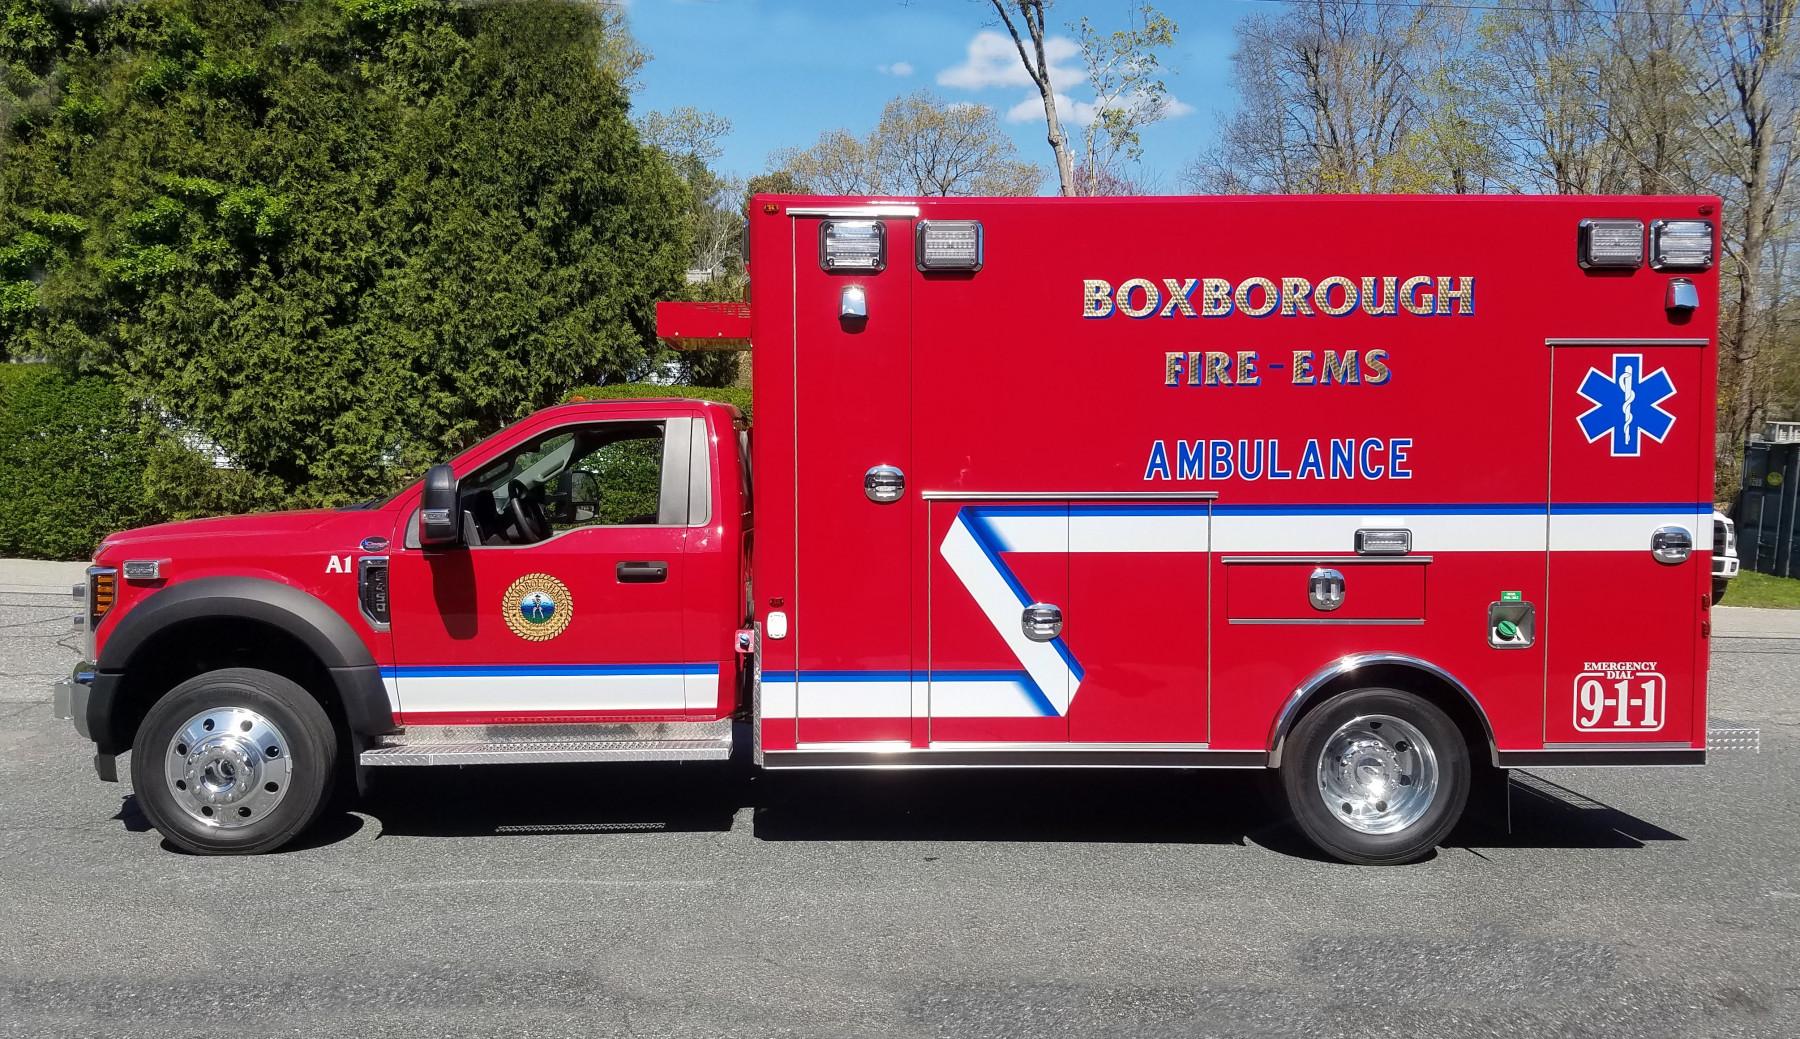 Boxborough-J2808